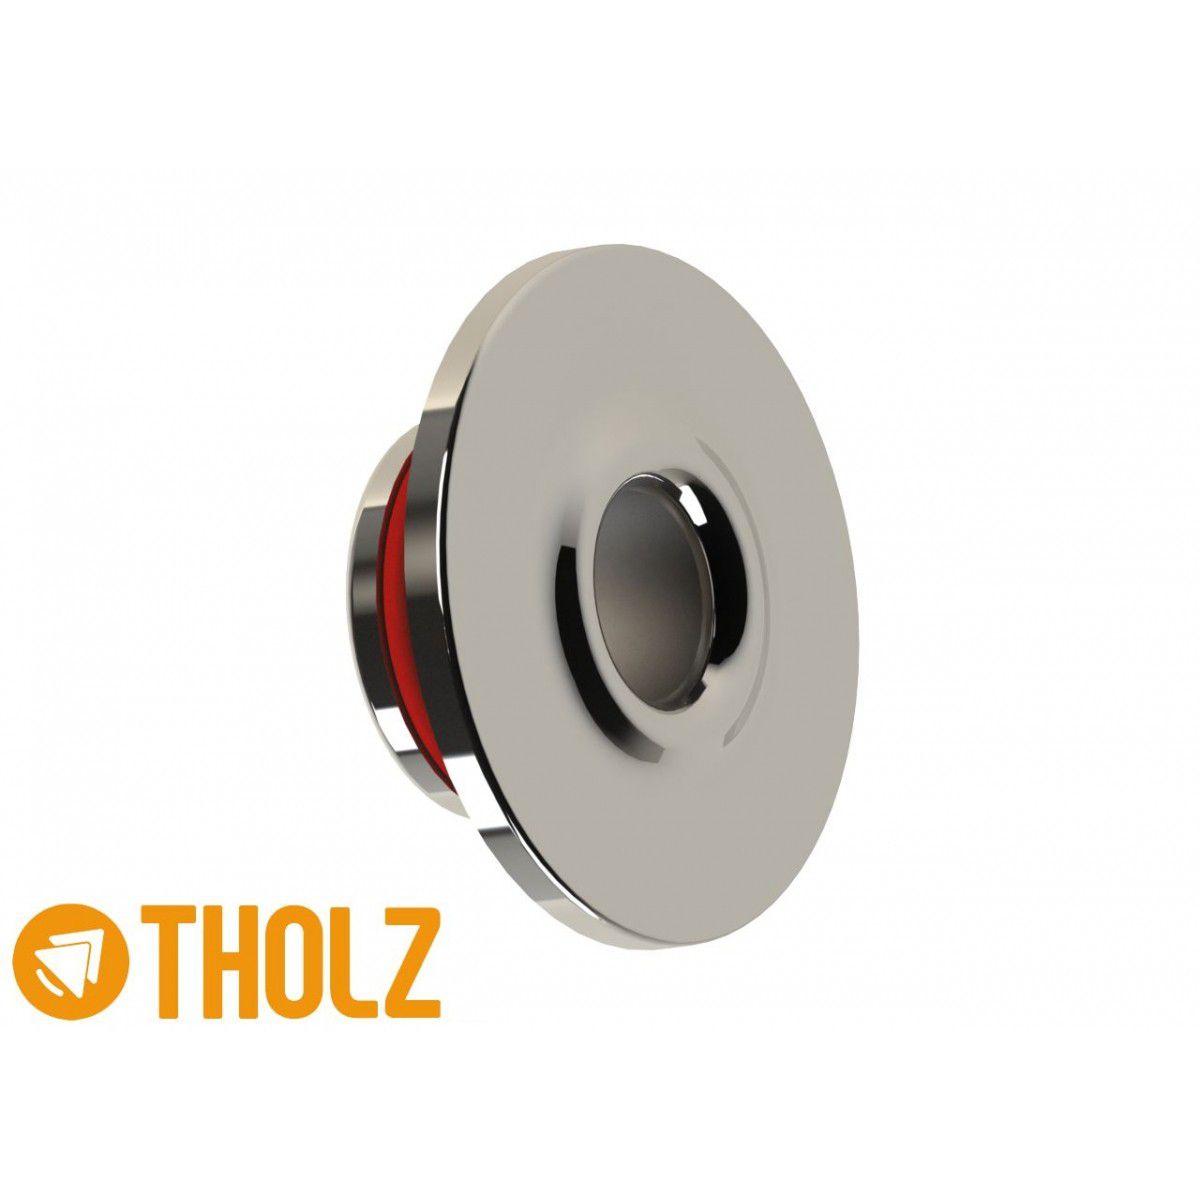 Dispositivo de Retorno Redondo Inox - Alvenaria - Tholz